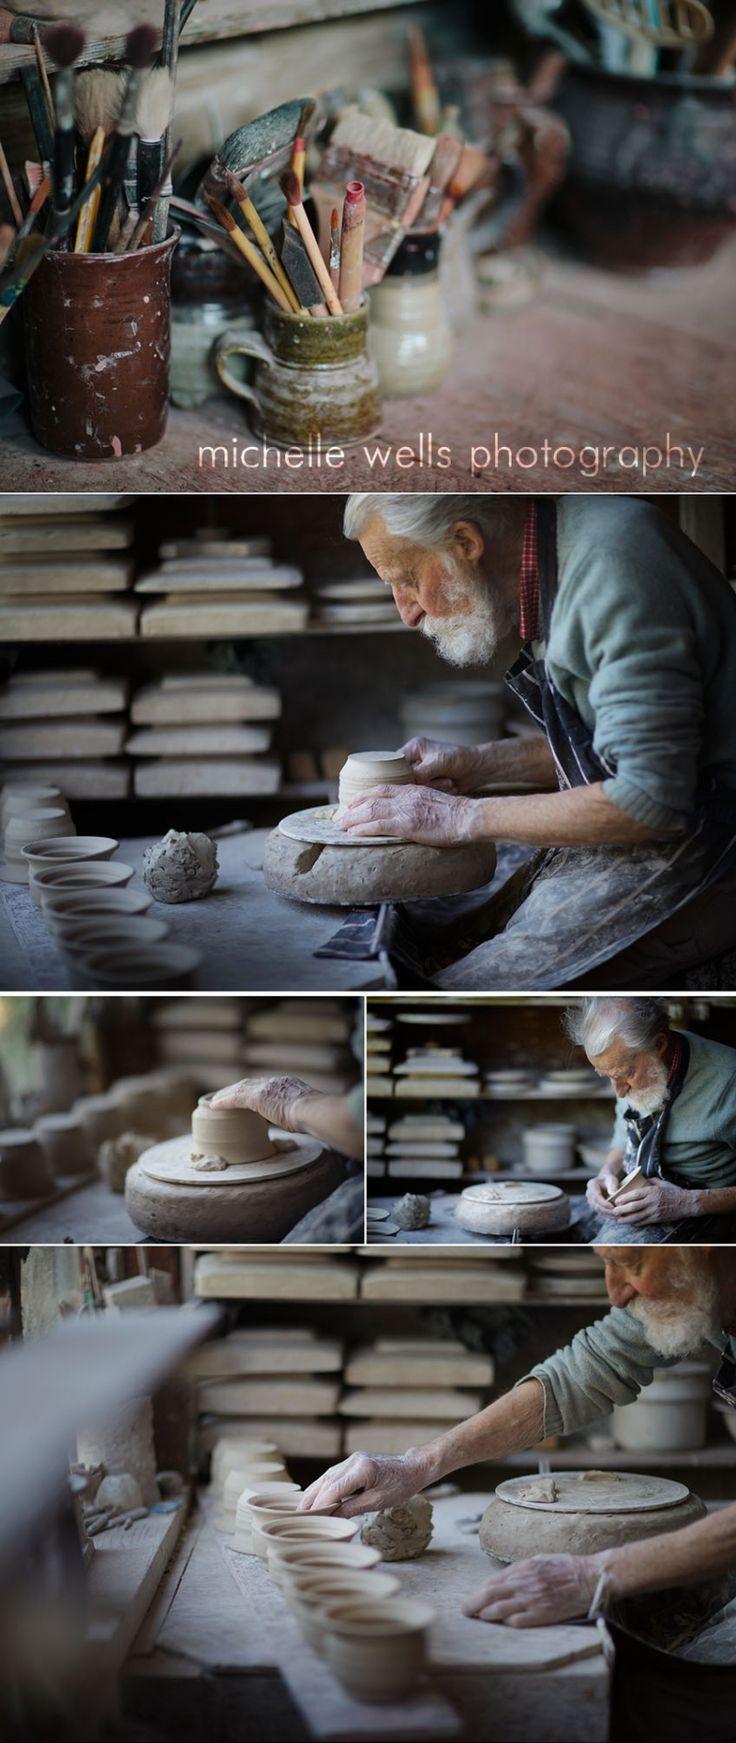 hornby island pottery Studio, vancouver island artisans www.michellewellsphotography